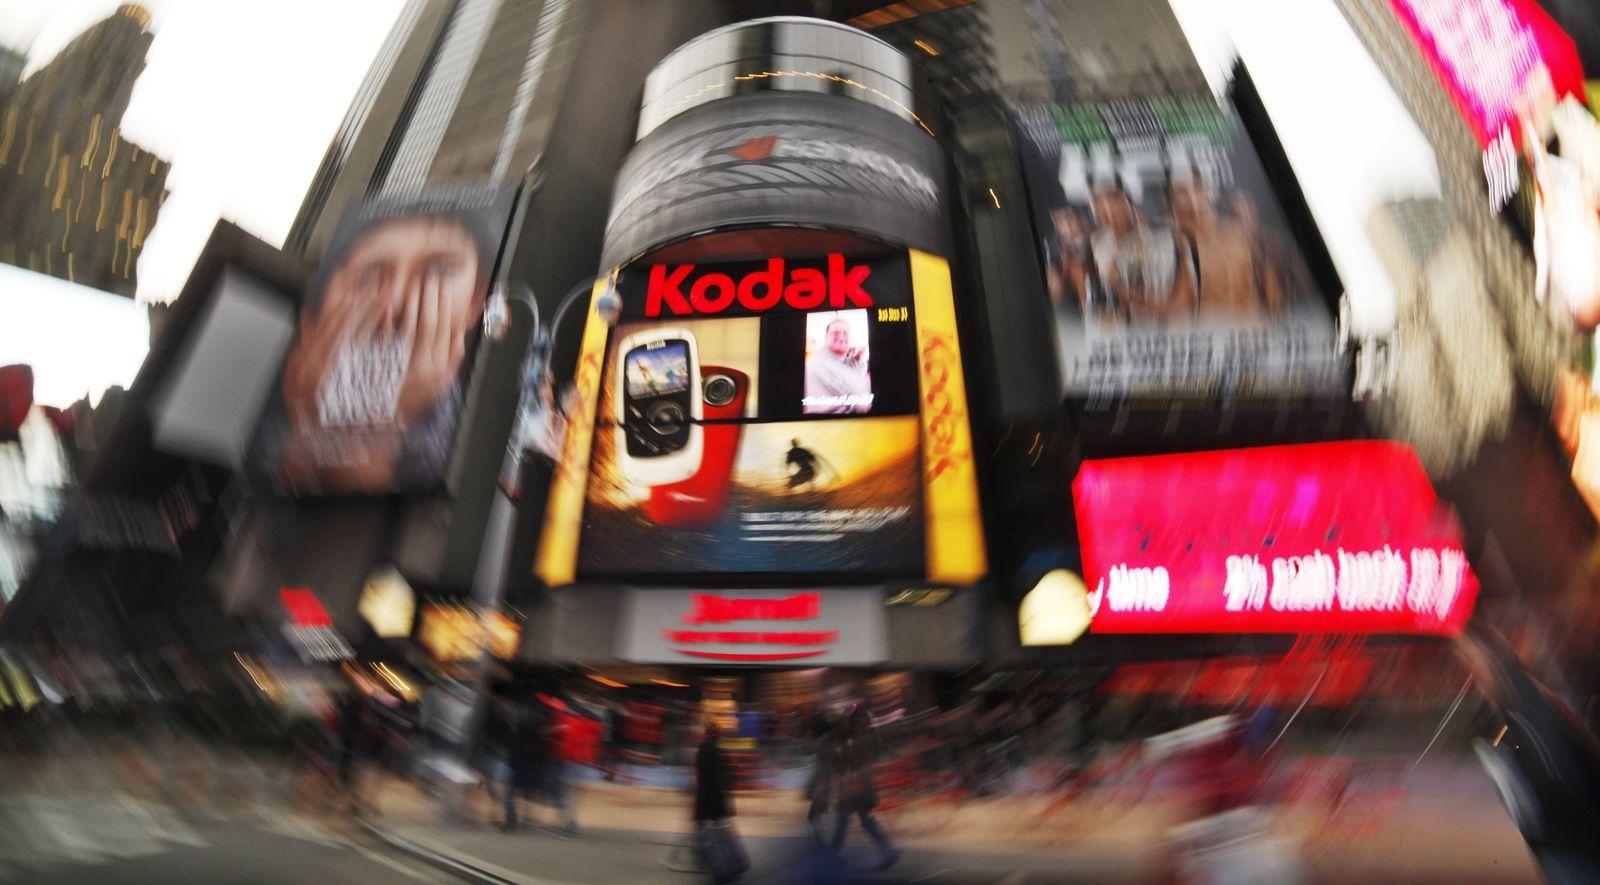 Kodak / Pleite / Insolvenz / Times Square